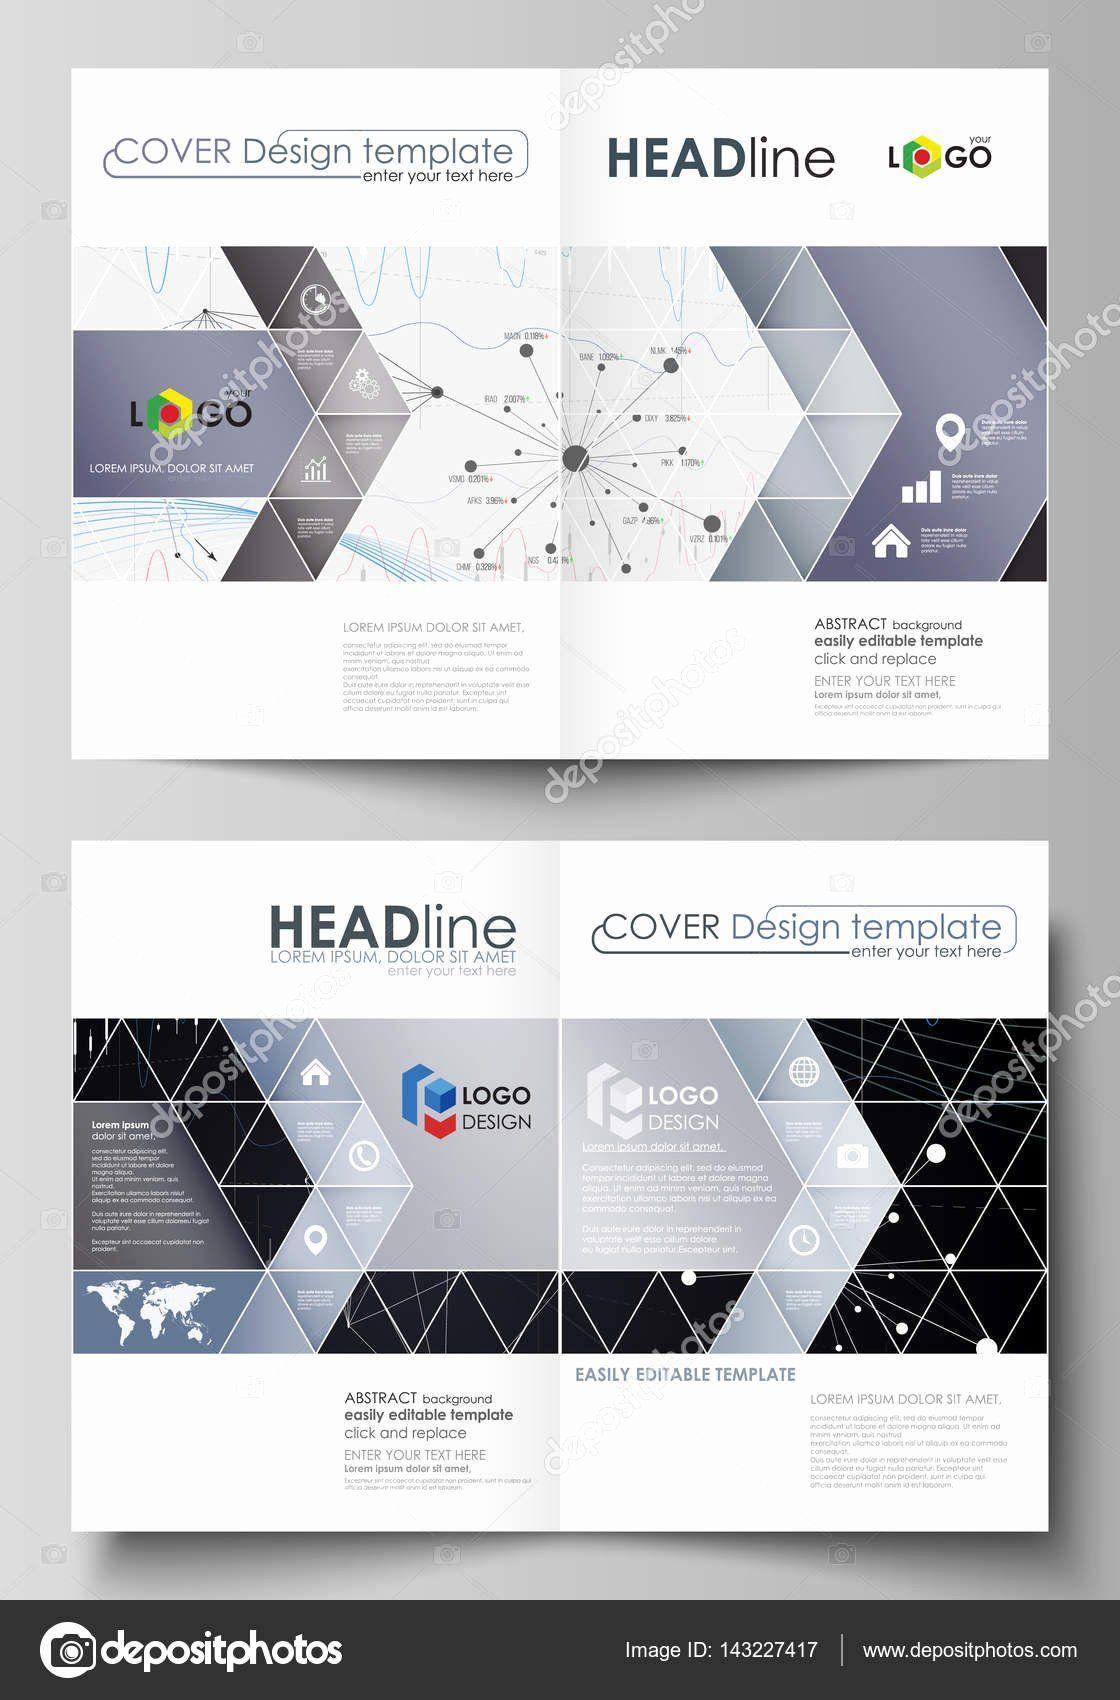 3 Panel Brochure Template Luxury Business Templates For Bi Fold Brochure Flyer Report Brochure Template Flyer Design Templates Bi Fold Brochure